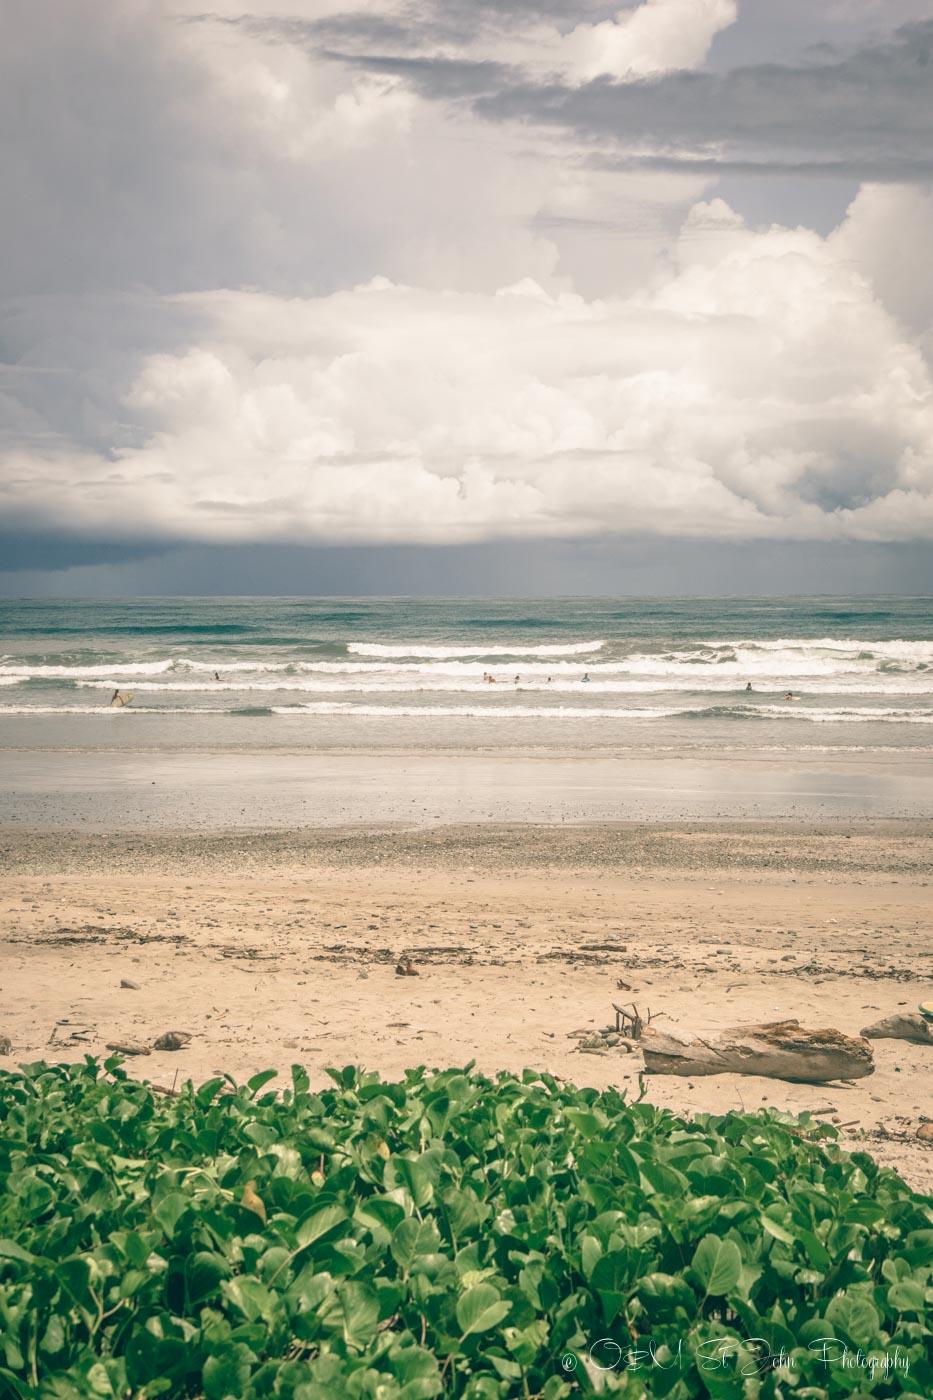 things to do in santa teresa costa rica: